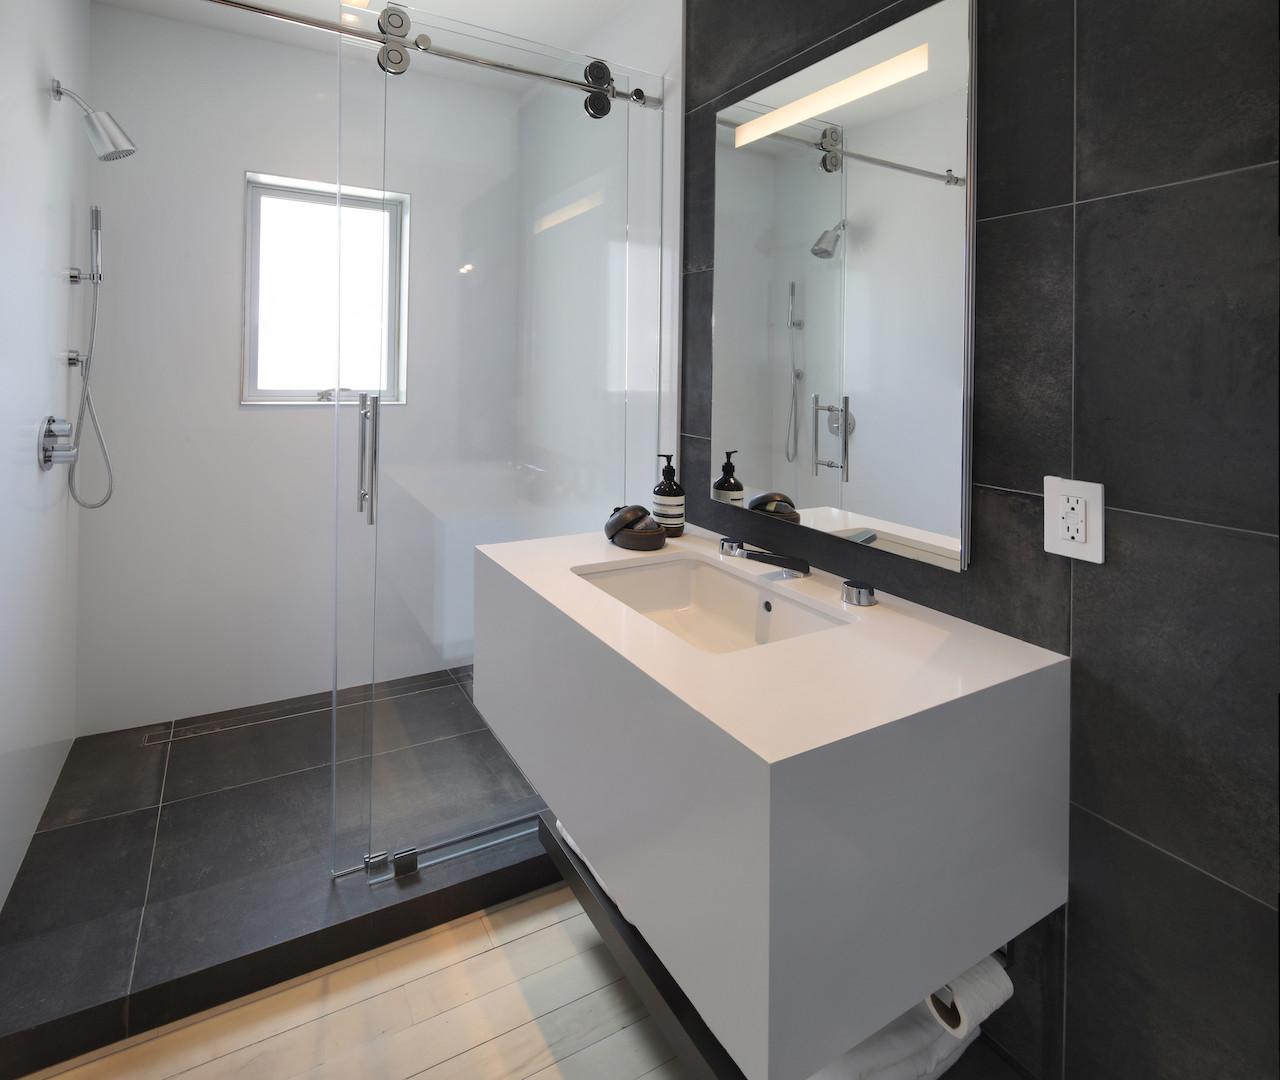 Powder room shaving shower.